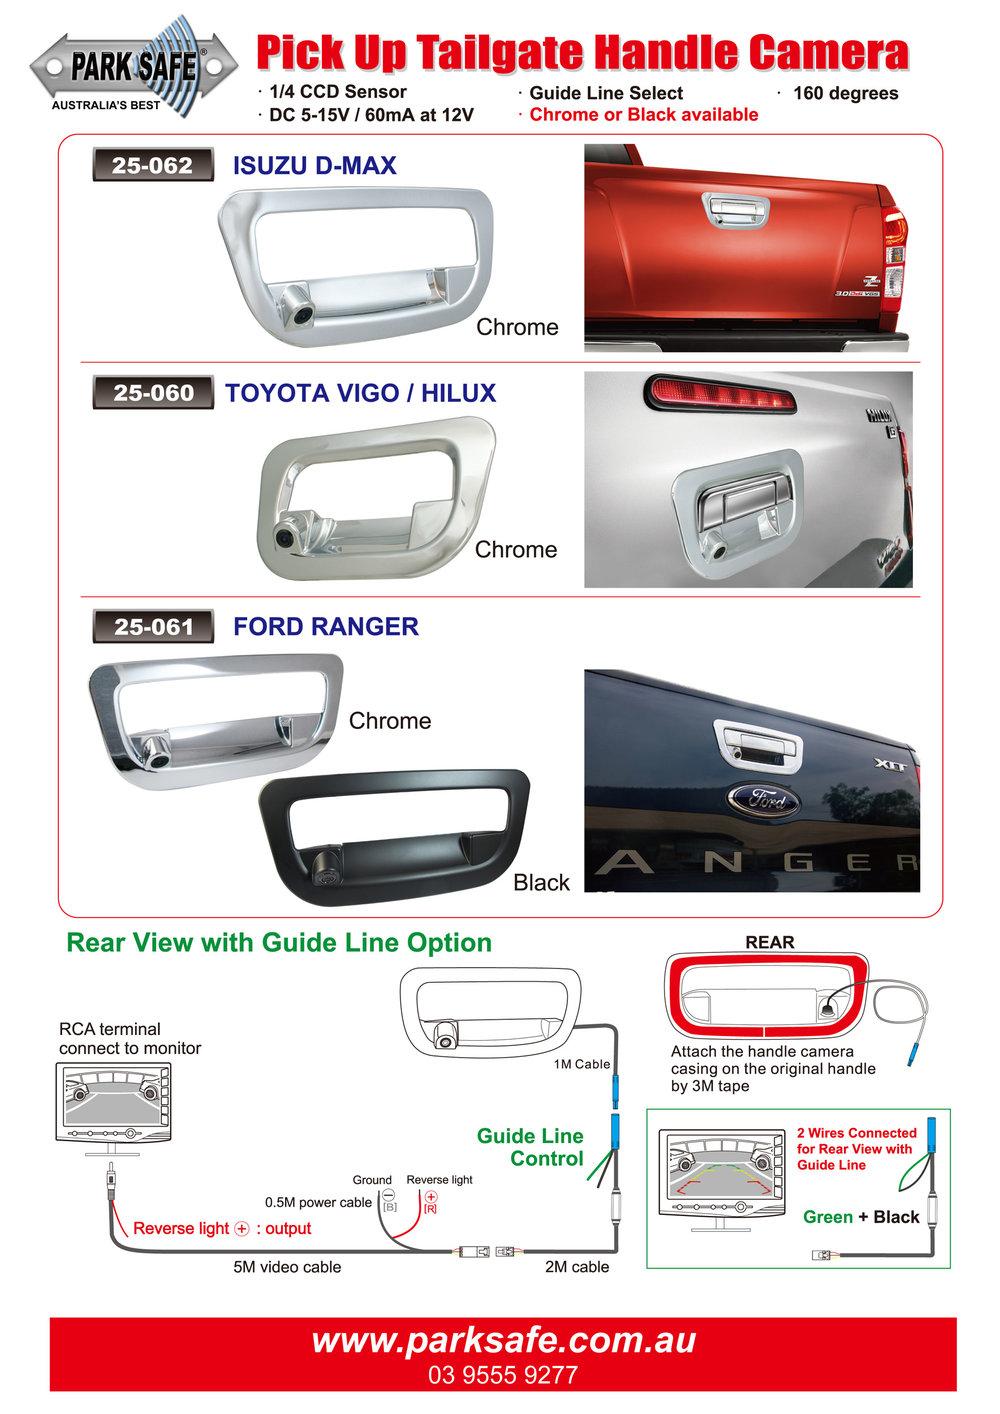 Tailgate Specific Model Cameras